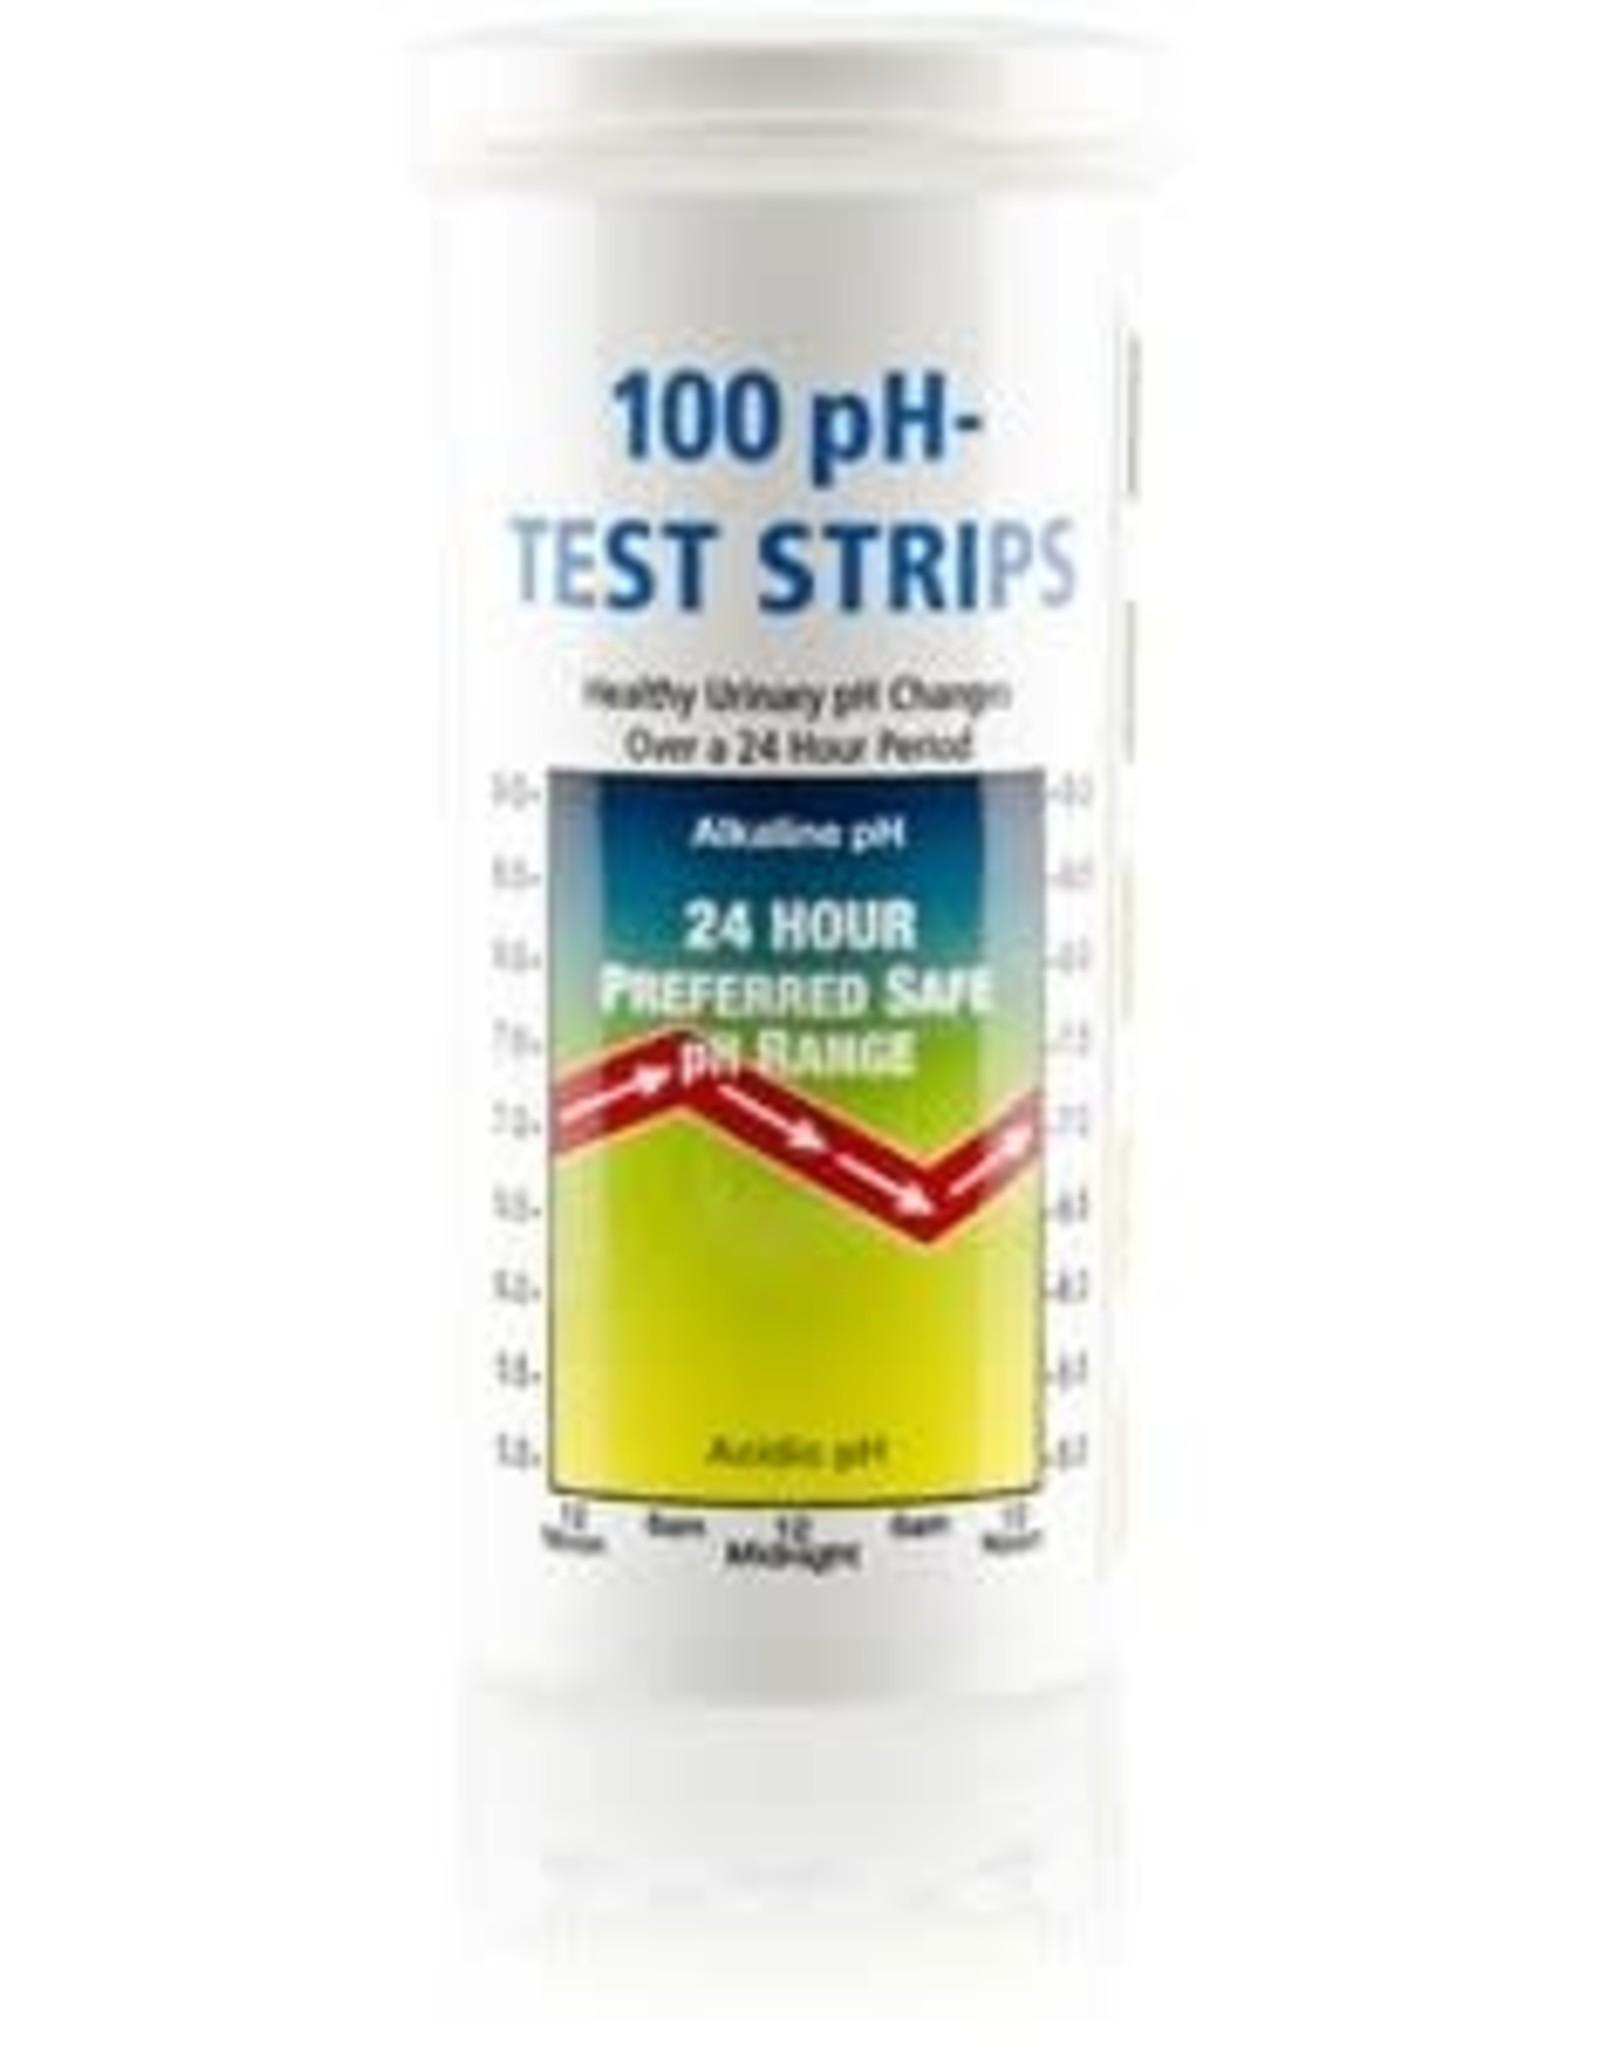 Nature's Sunshine PH TEST STRIPS (100)